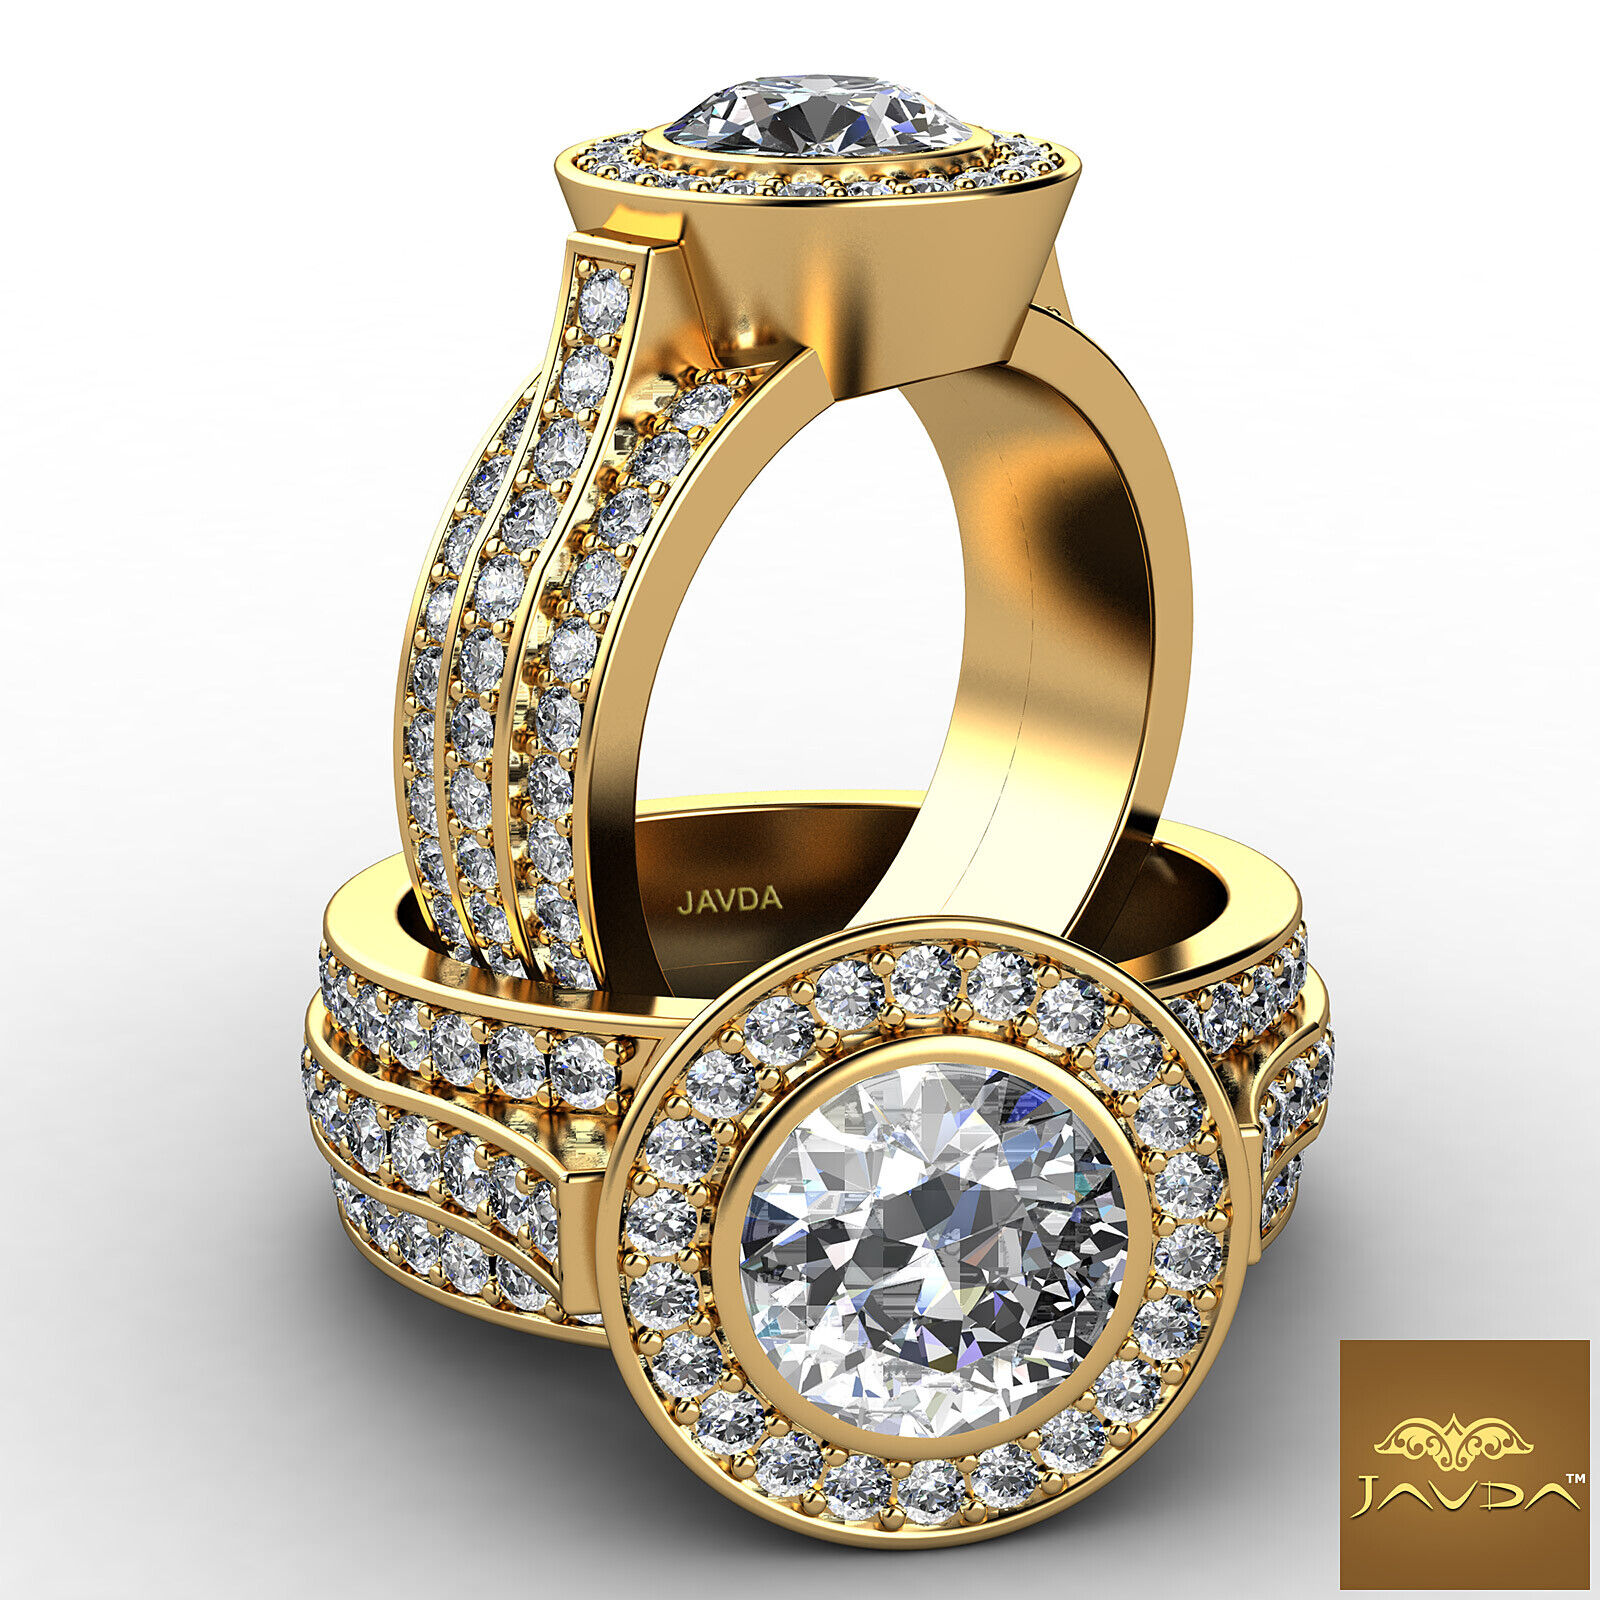 3 Row Shank Shared Prong Round Diamond Engagement Bezel Ring GIA I VS2 3.15 Ct